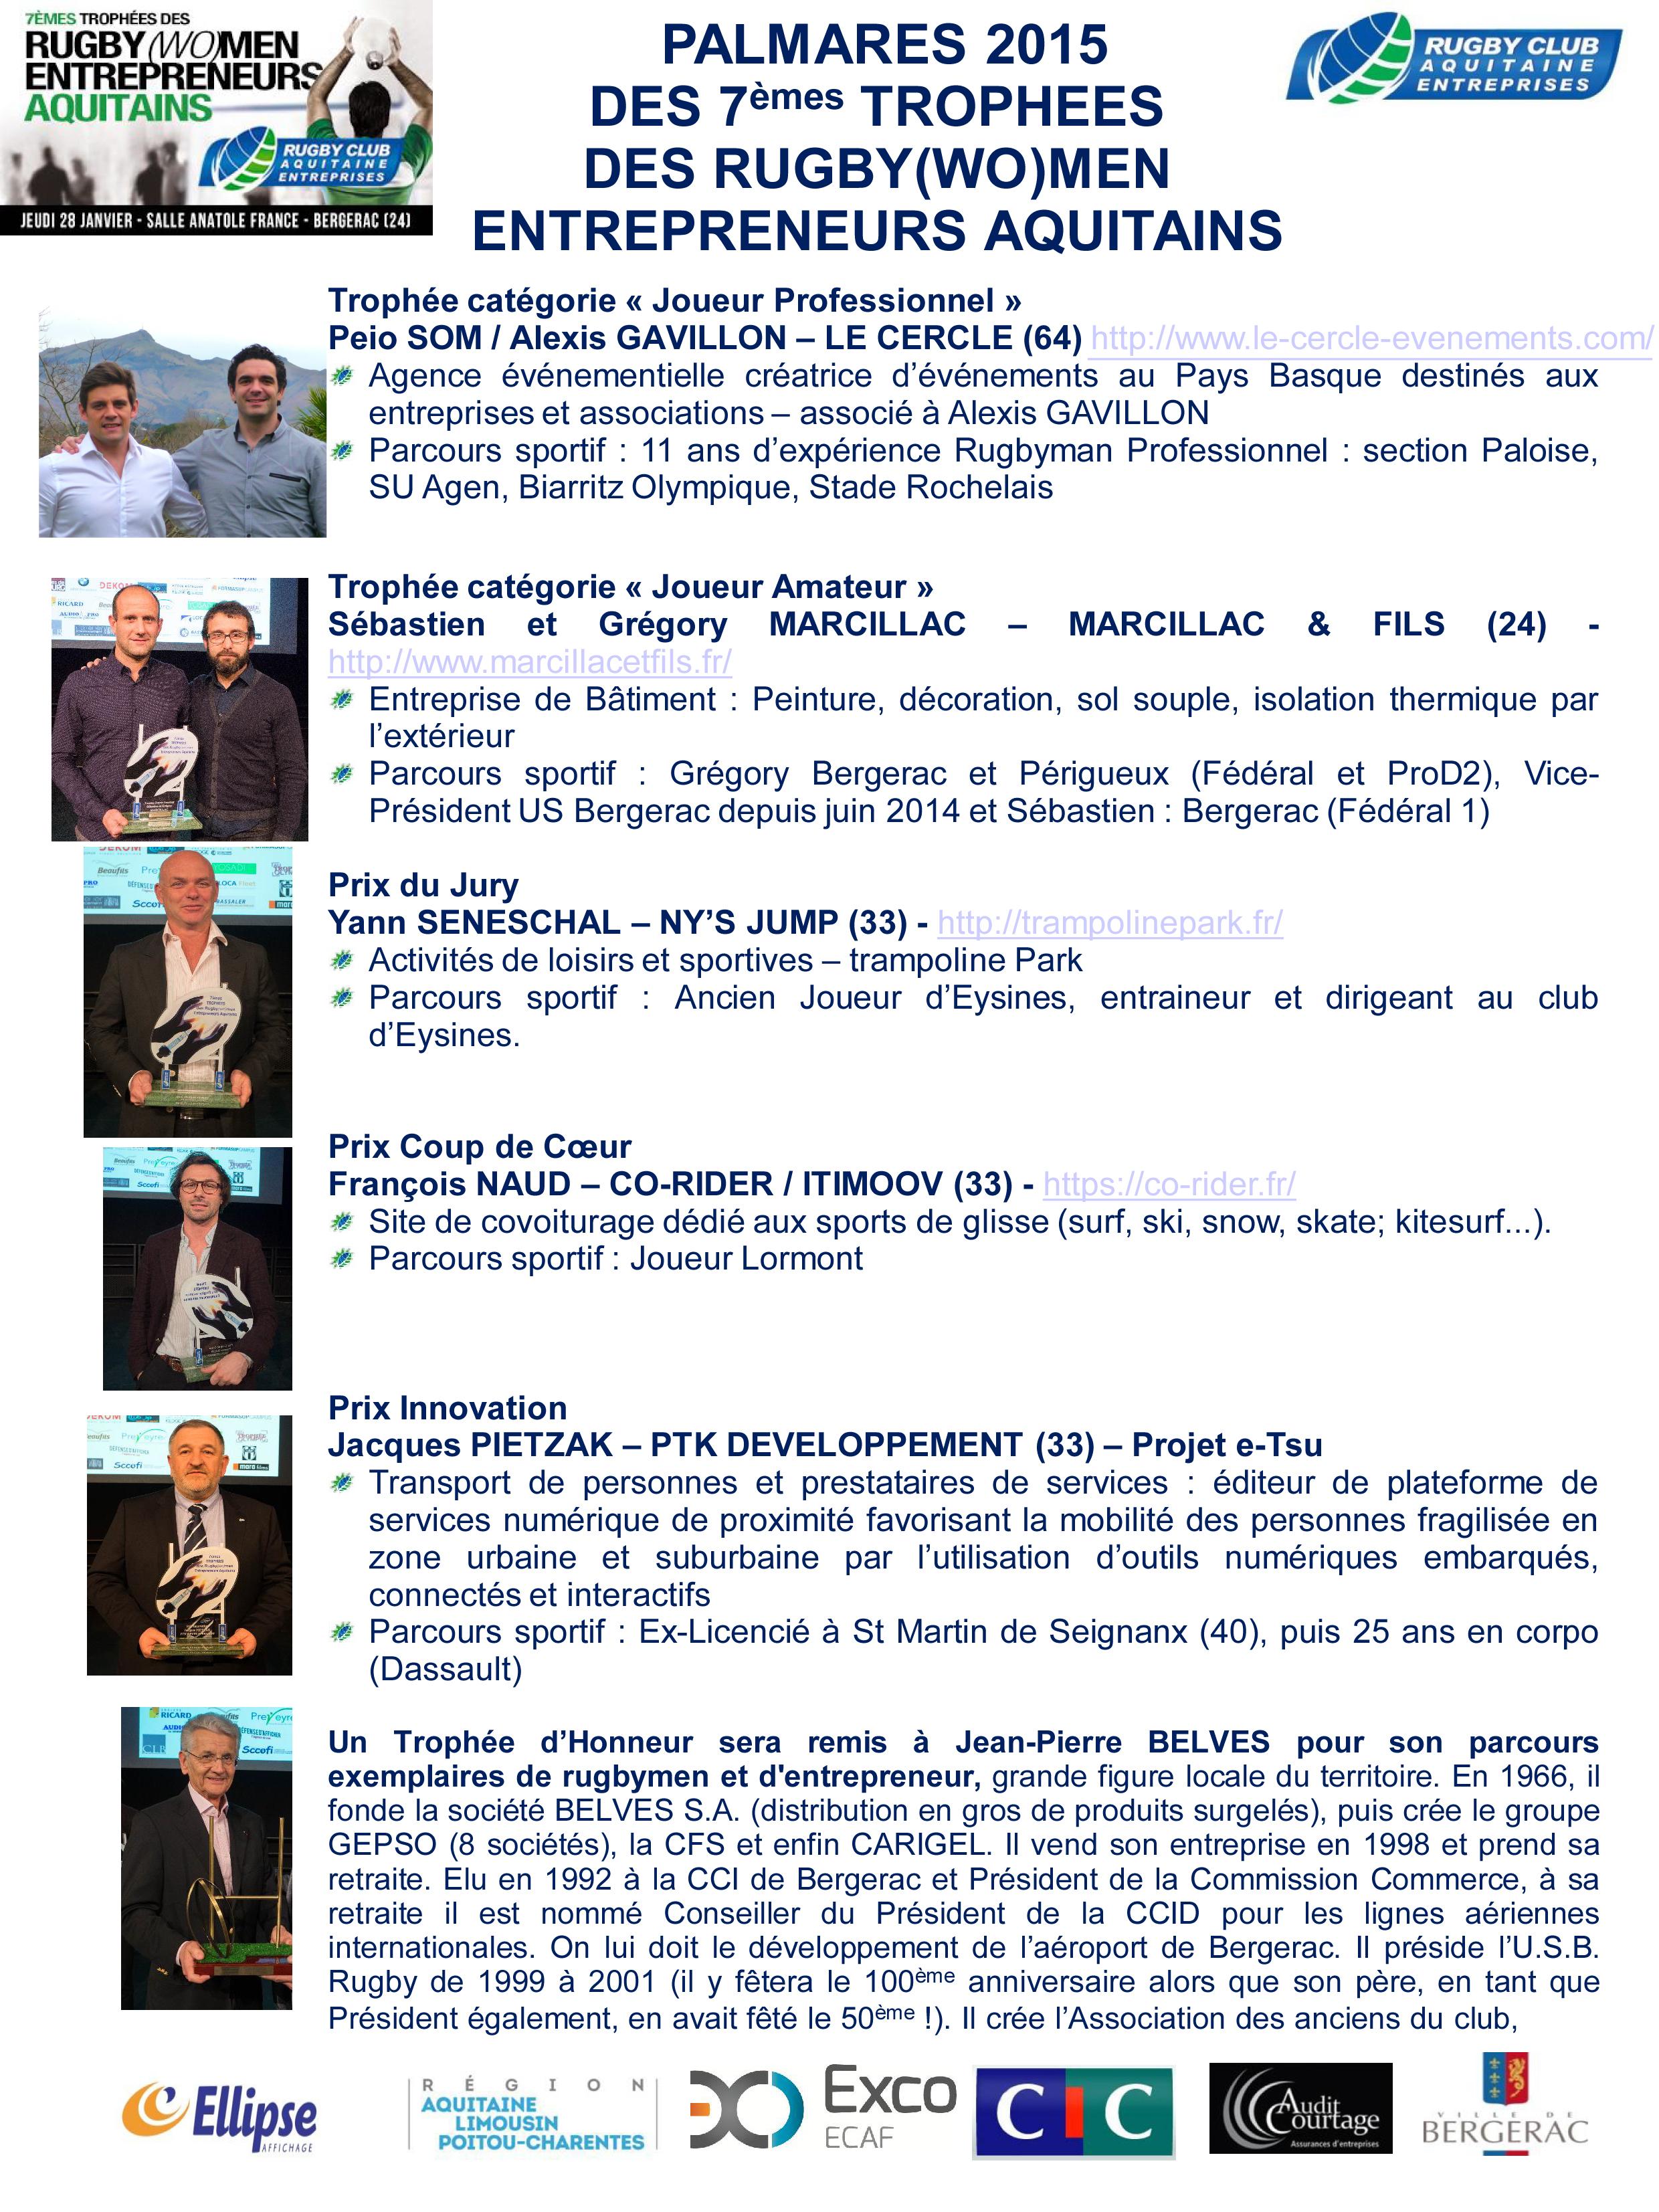 agence evenementielle voyage seminaire pays basque biarritz Erronda recompense rugby club aquitaine entreprise 3